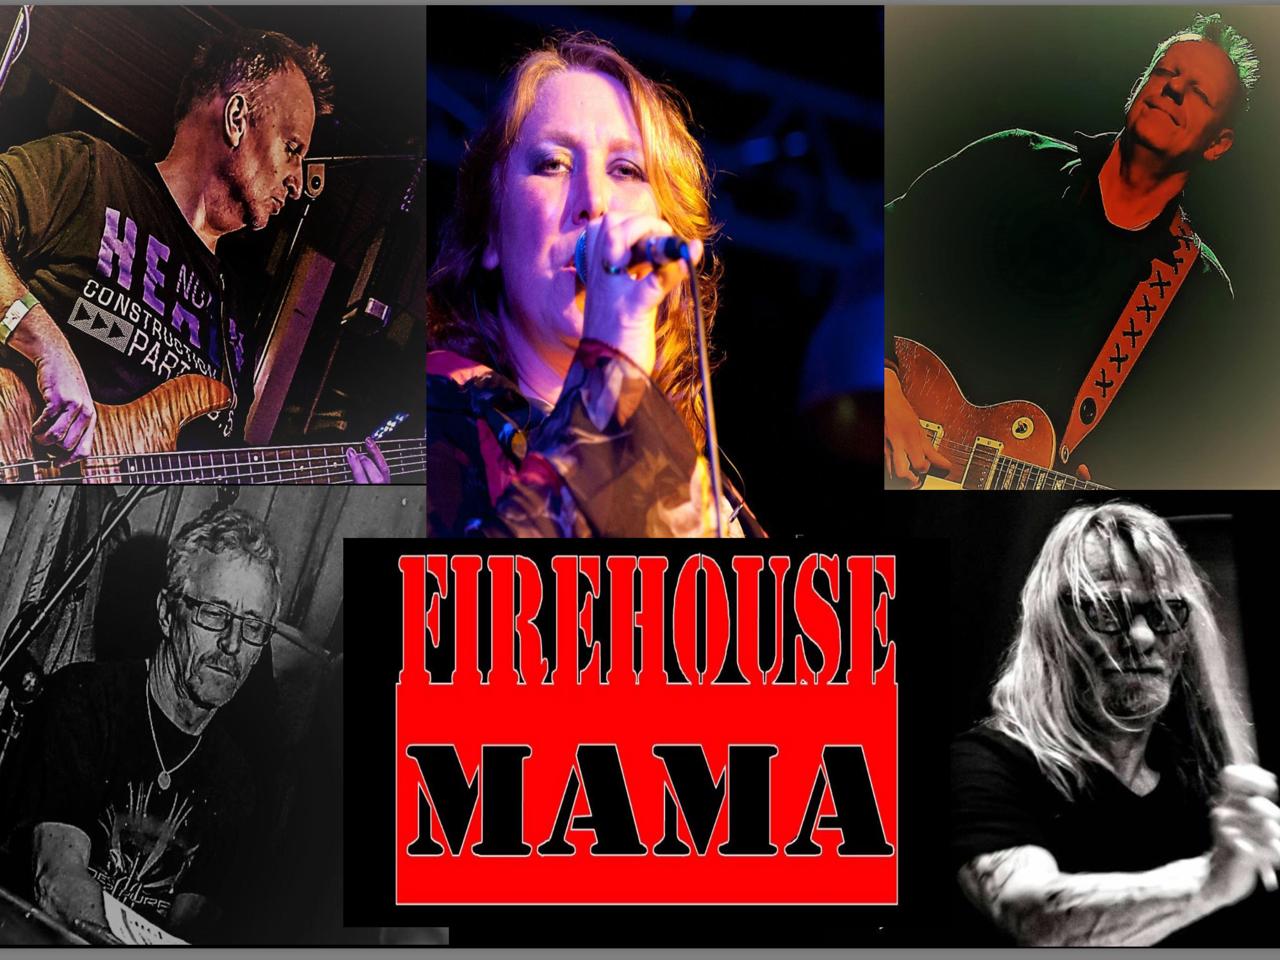 Firehouse Mama